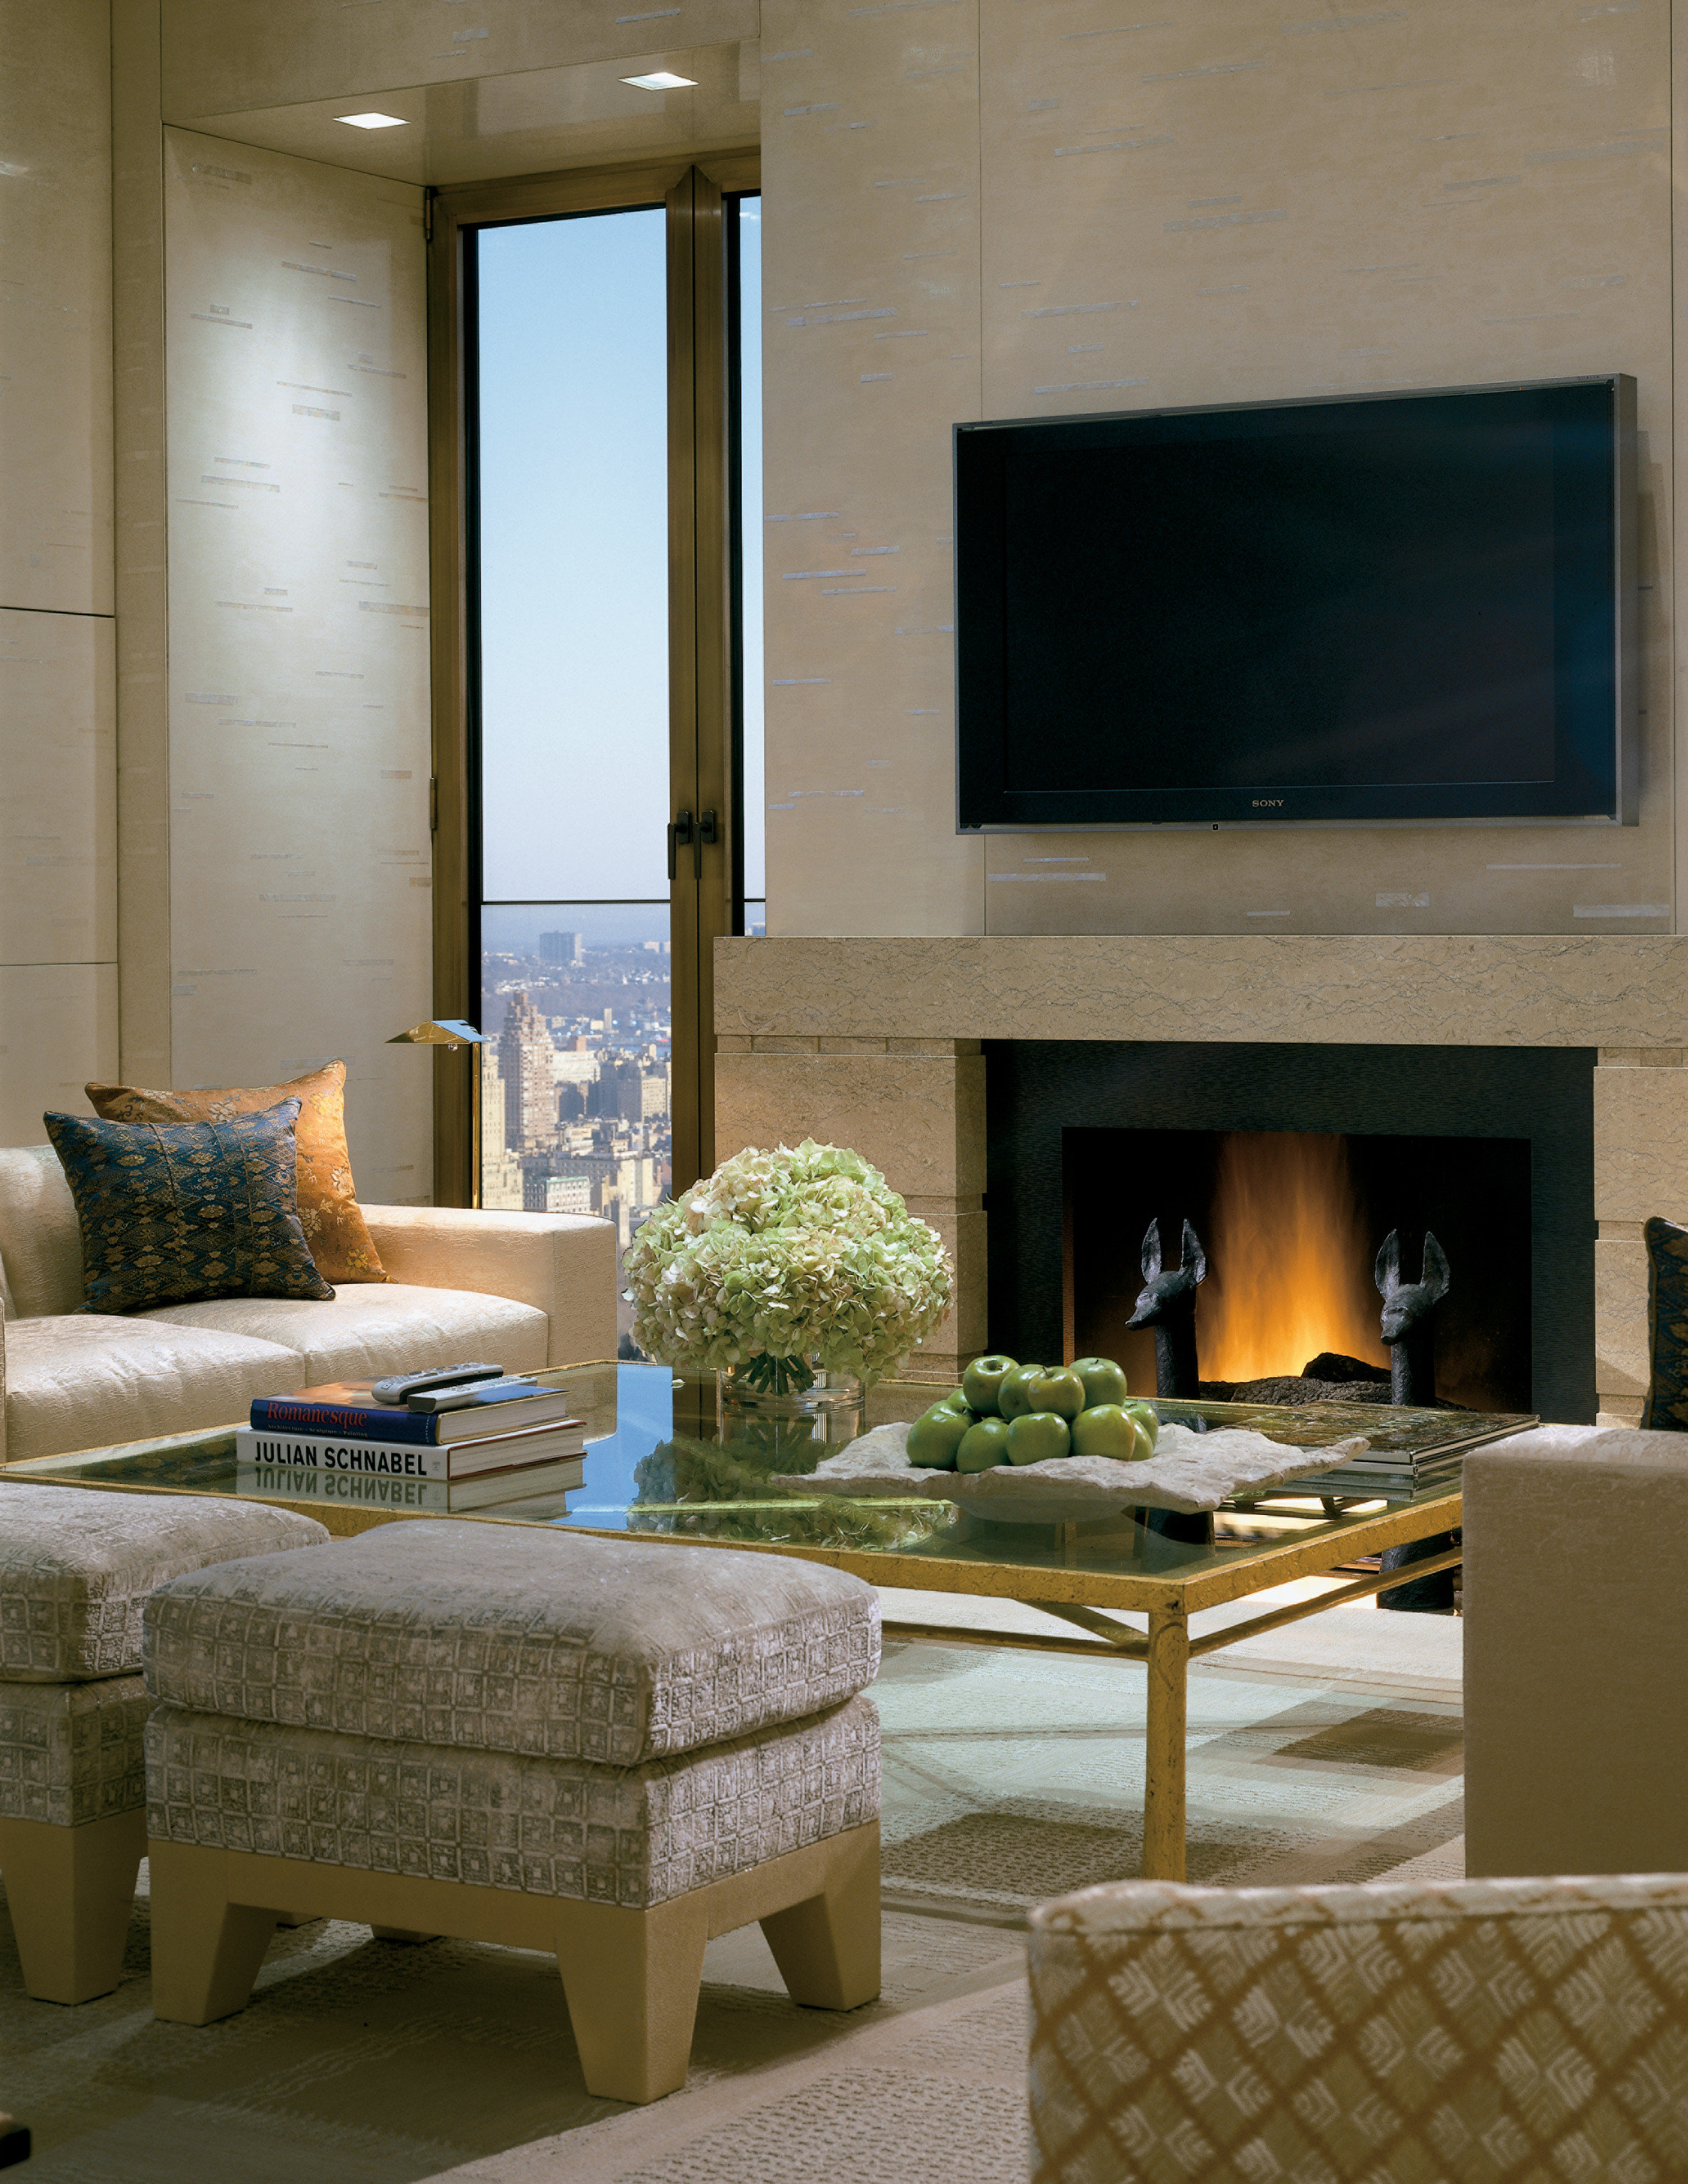 Hotels Luxury Travel Living living room indoor interior design room hearth Fireplace home furniture table ceiling window interior designer floor flooring stone